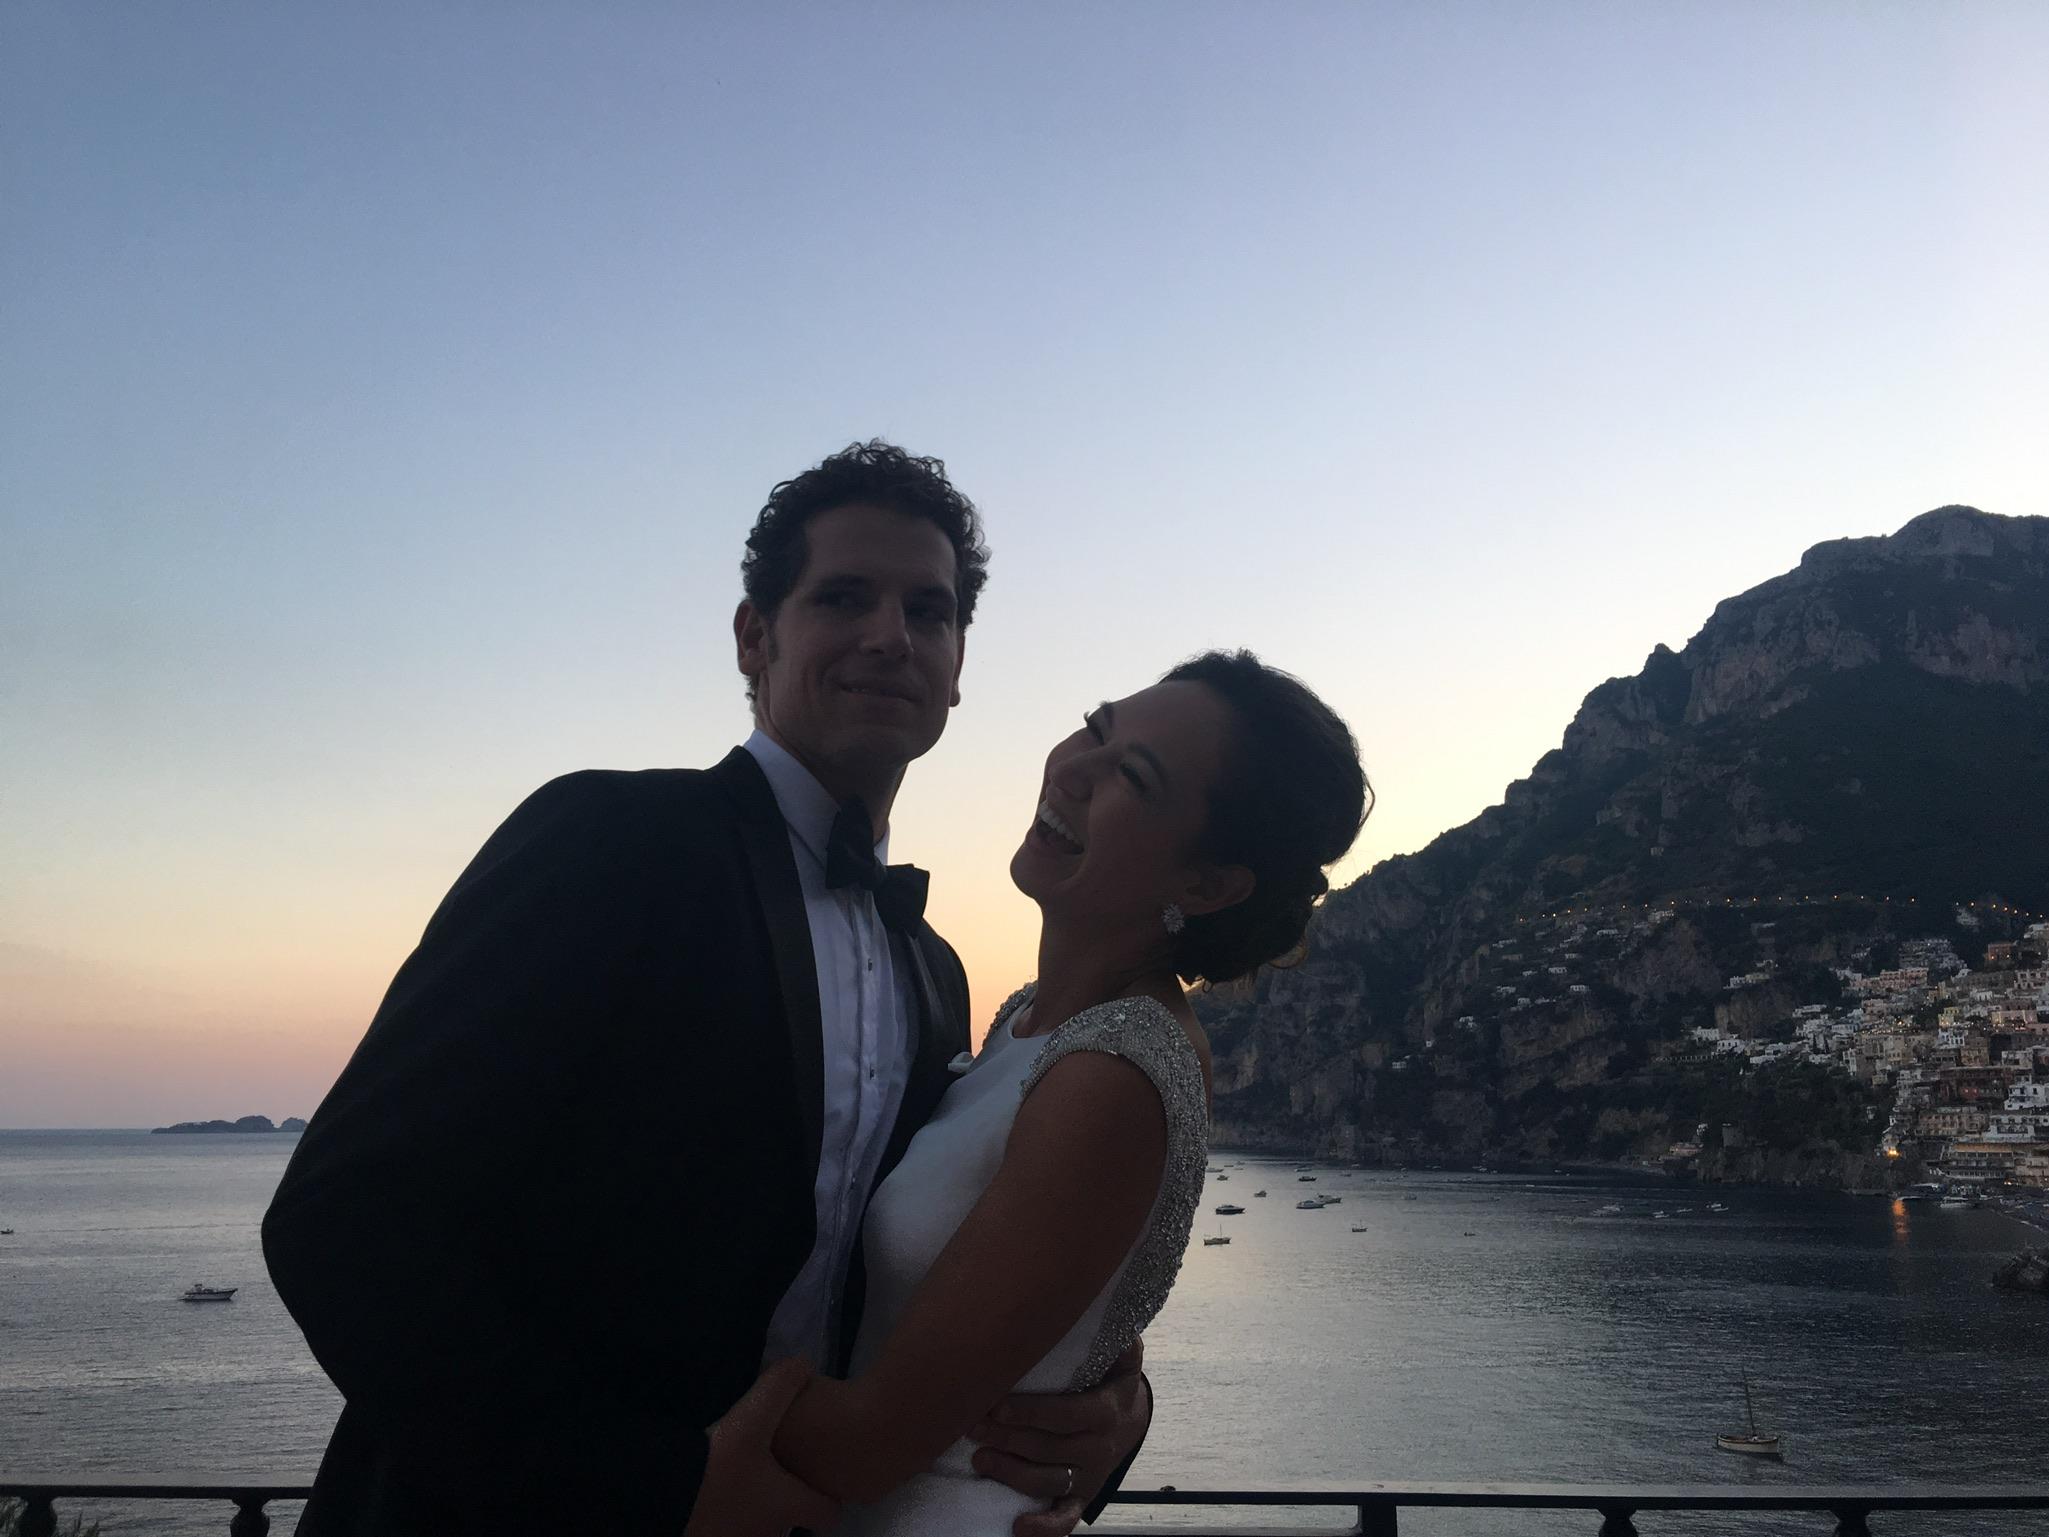 https://www.weddingamalfi.com/wp-content/uploads/Nathalie-and-Benjamin-wedding-in-Positano-30.jpg